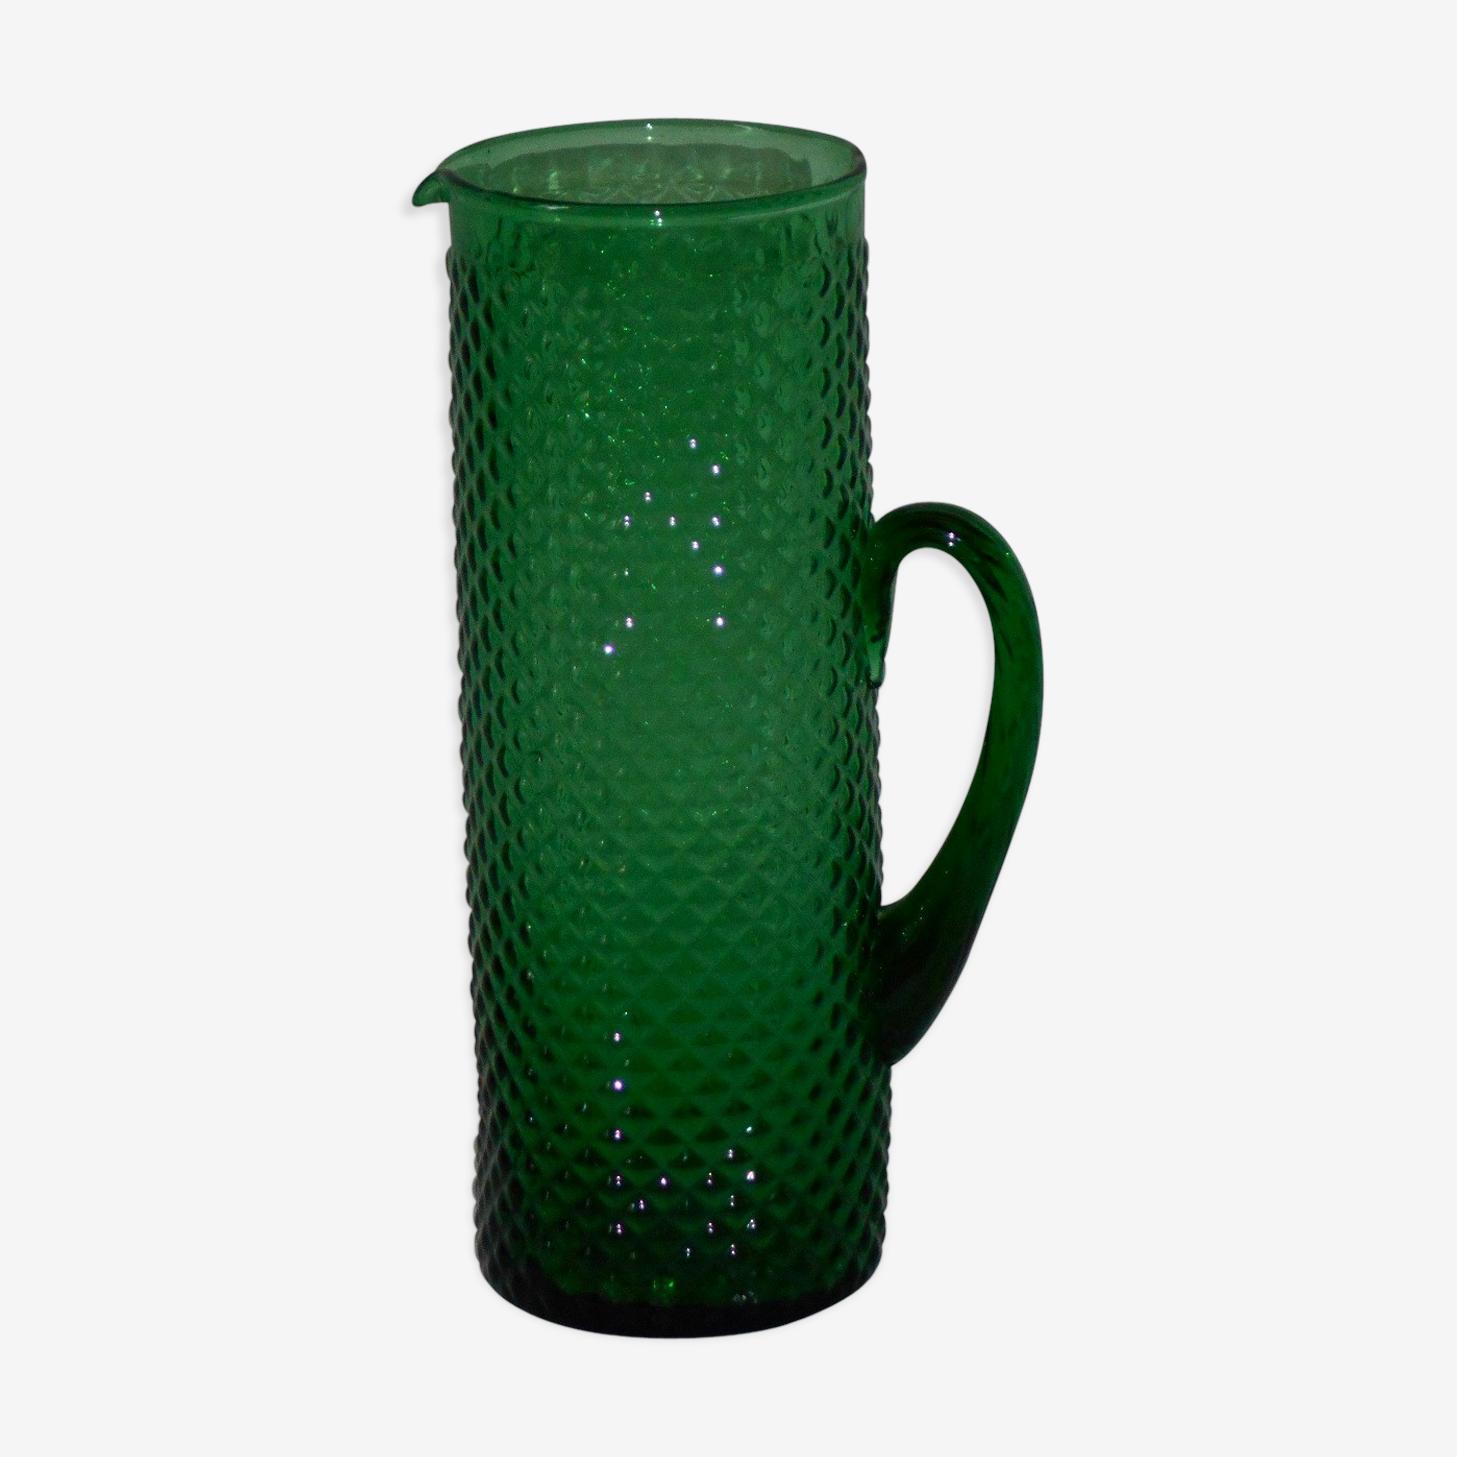 Broc vintage verre couleur vert émeraude